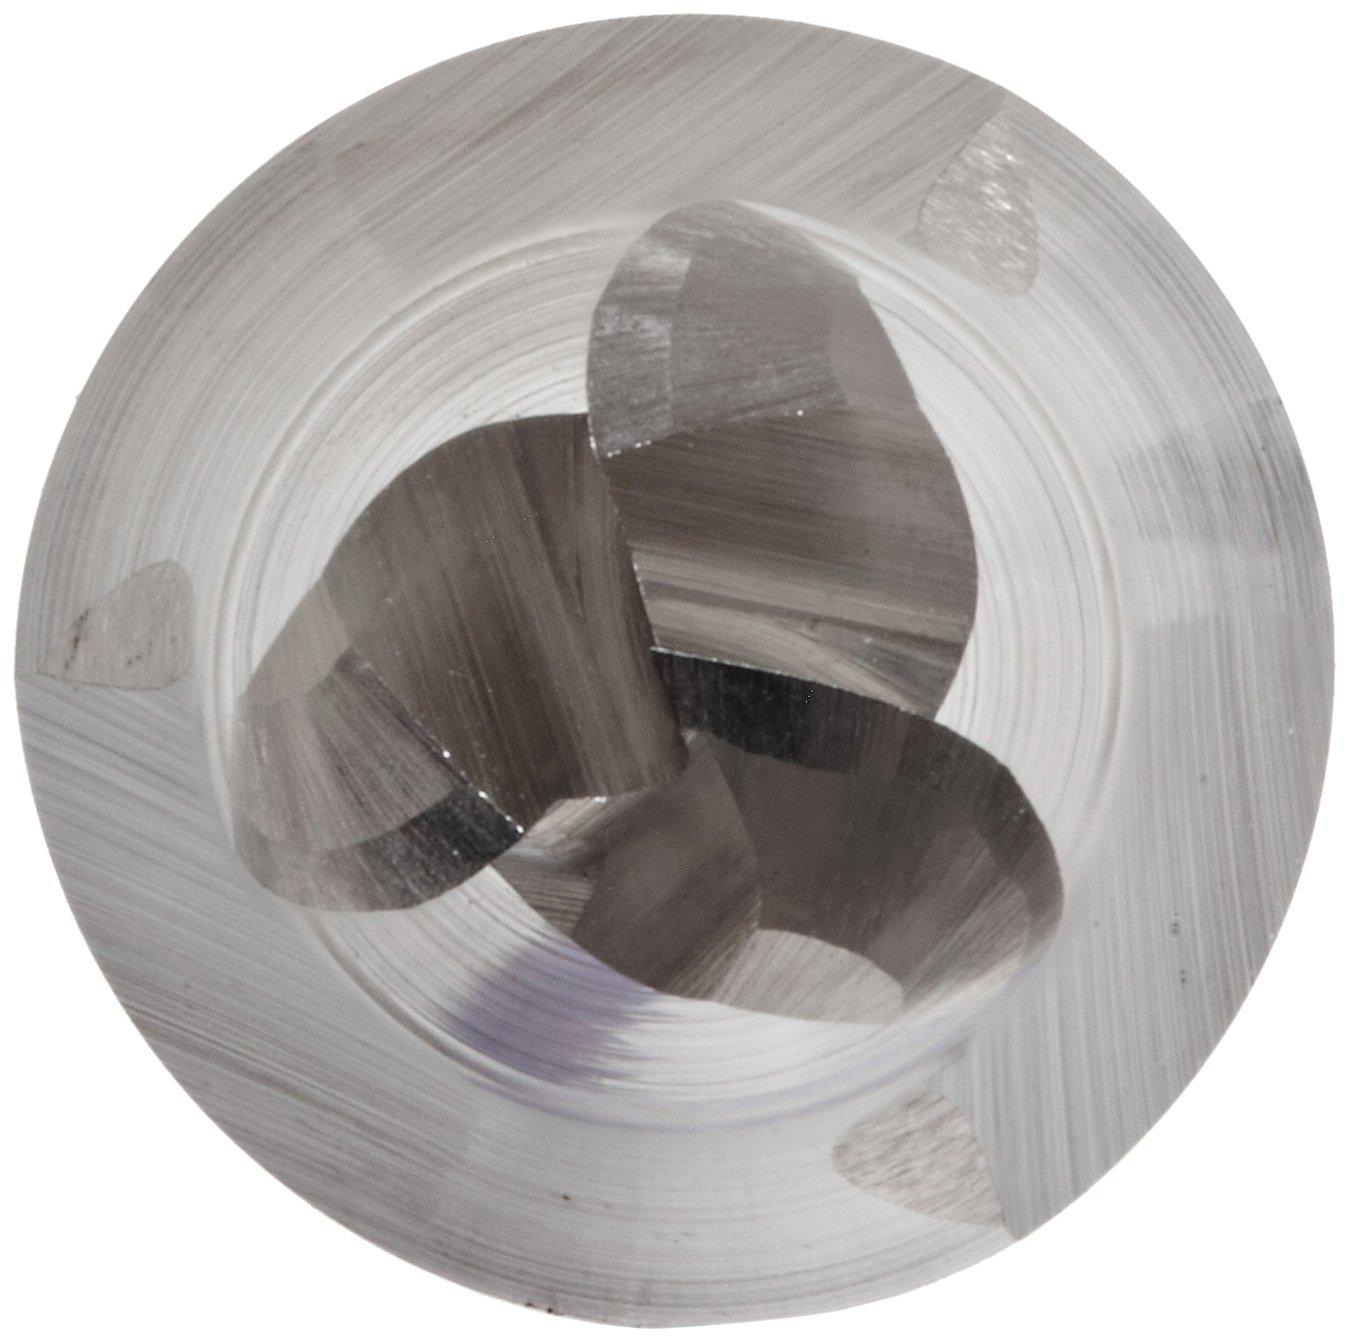 Melin Tool CCMG-M-M-L Carbide Square Nose End Mill Metric AlTiN Monolayer Finish 20mm Shank Diameter 127mm Overall Length 30 Deg Helix 20mm Cutting Diameter 4 Flutes